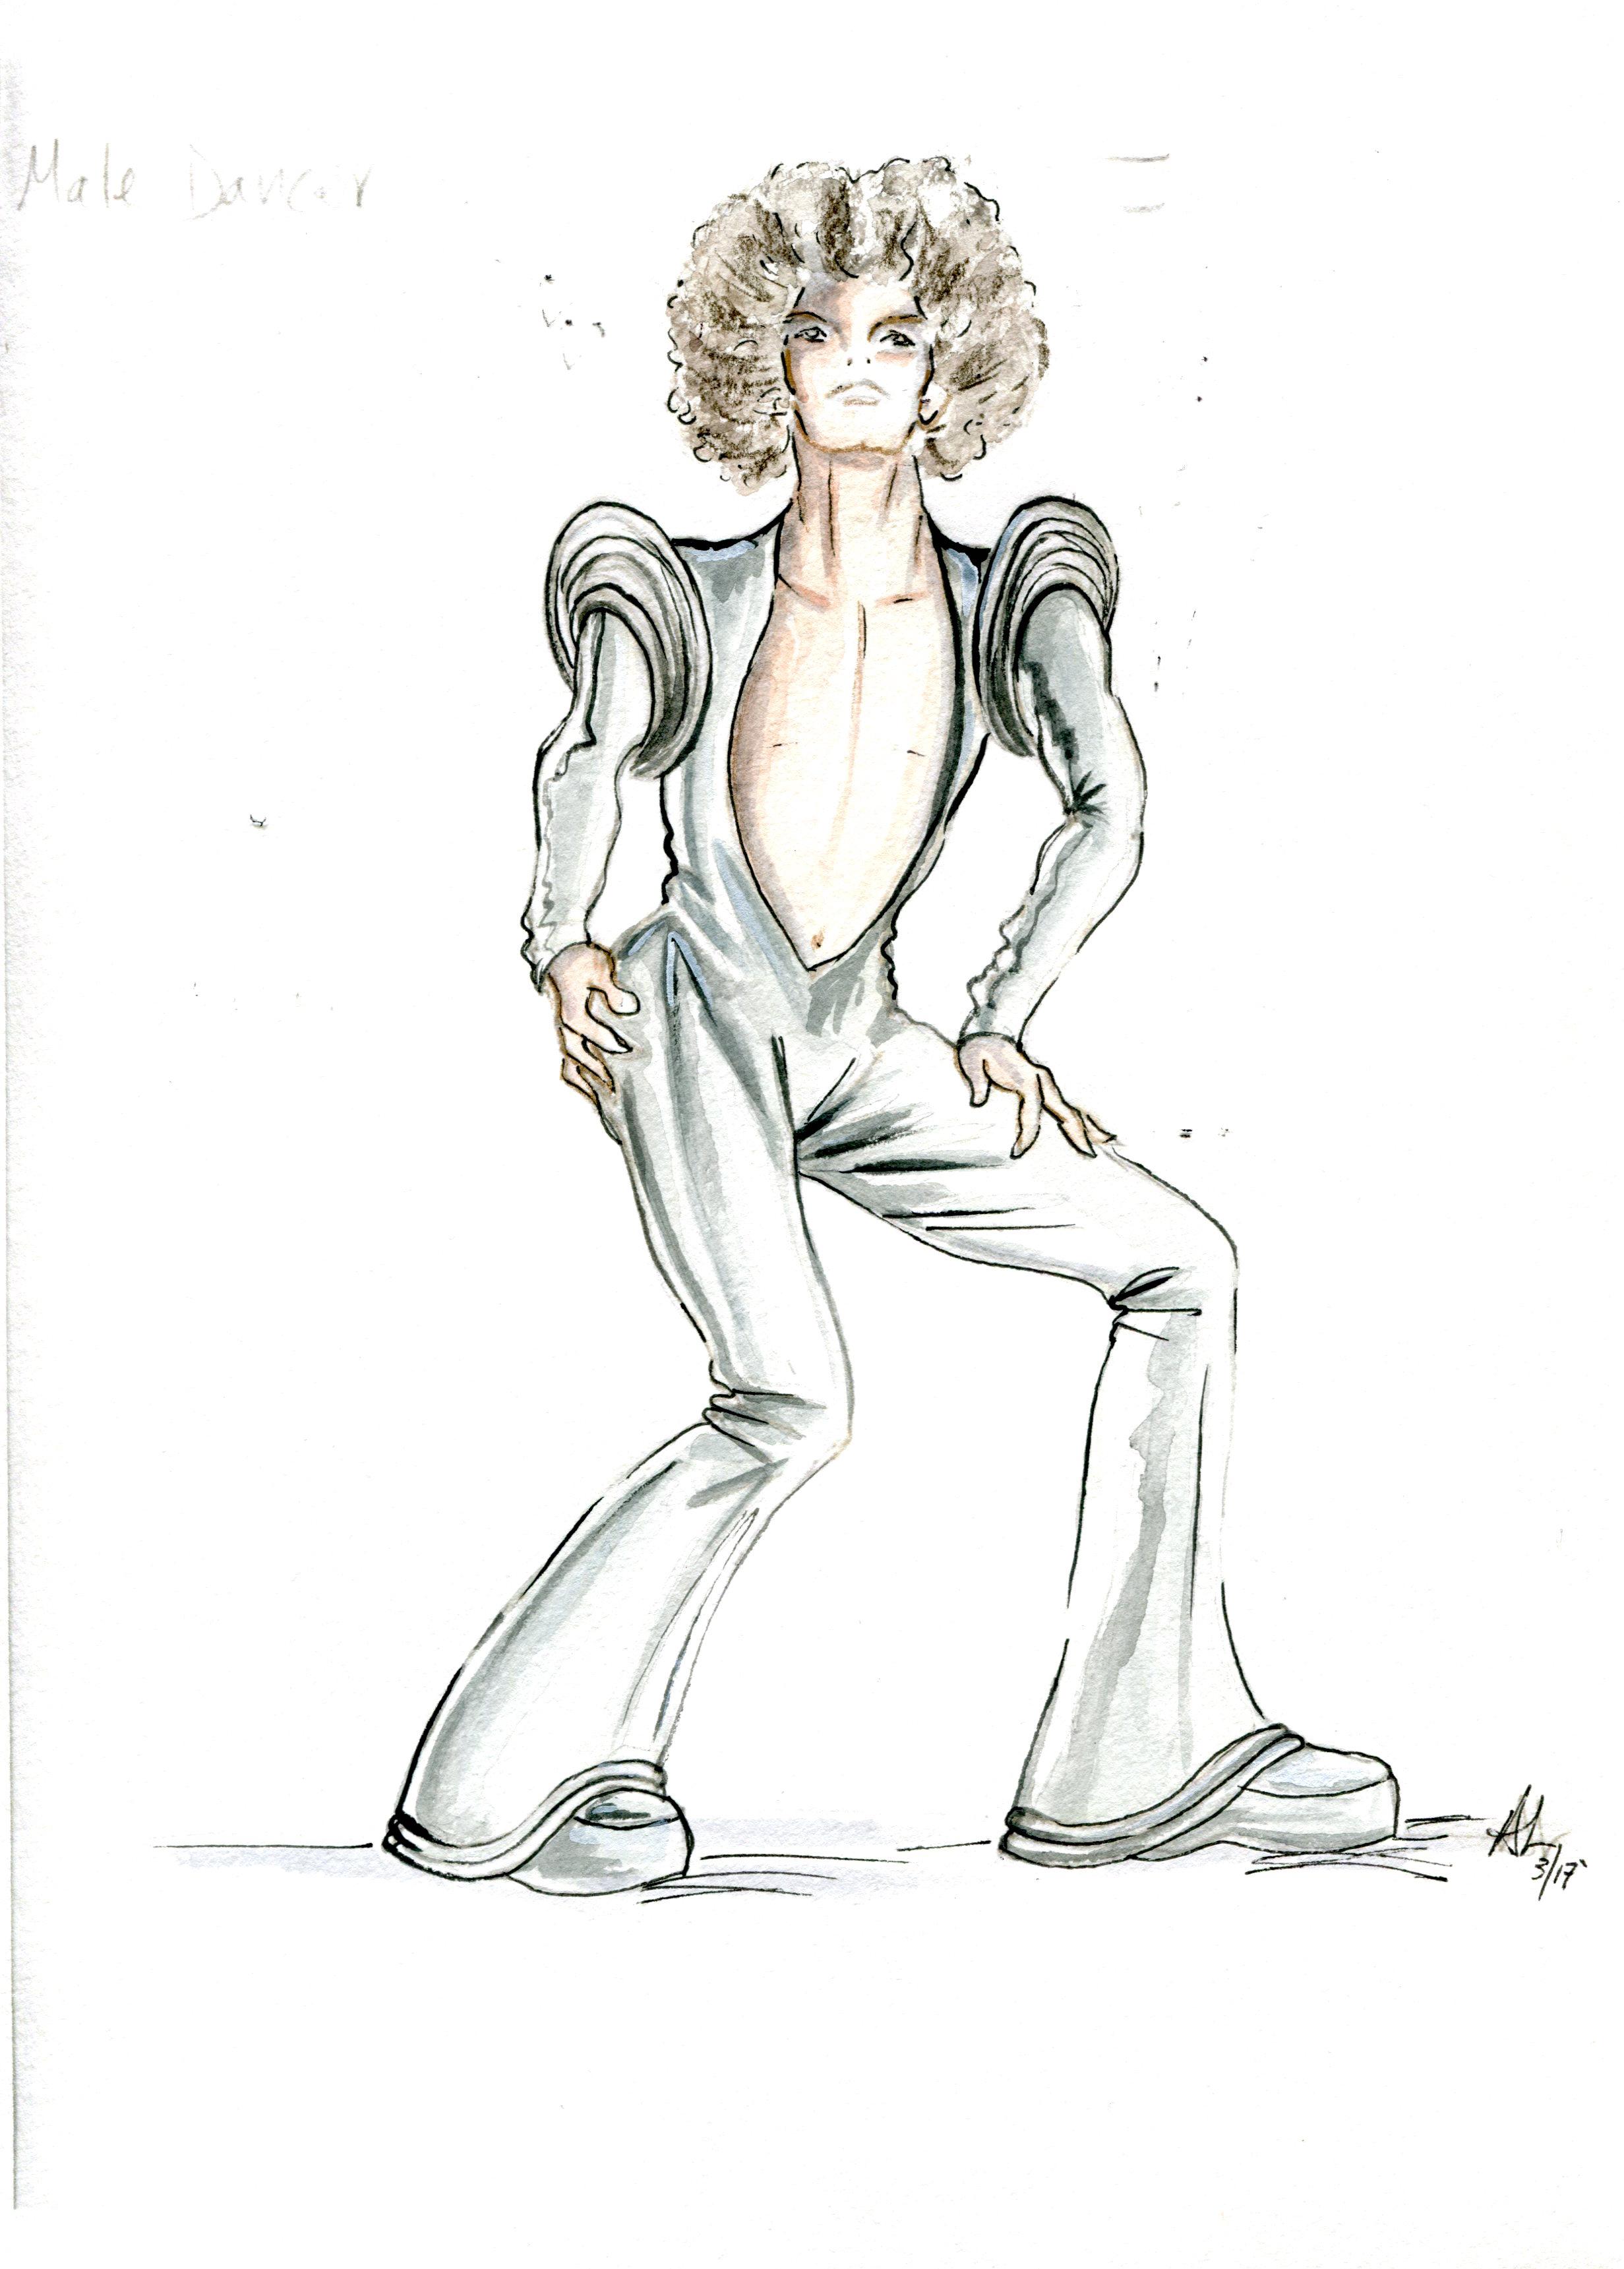 Male Dancer